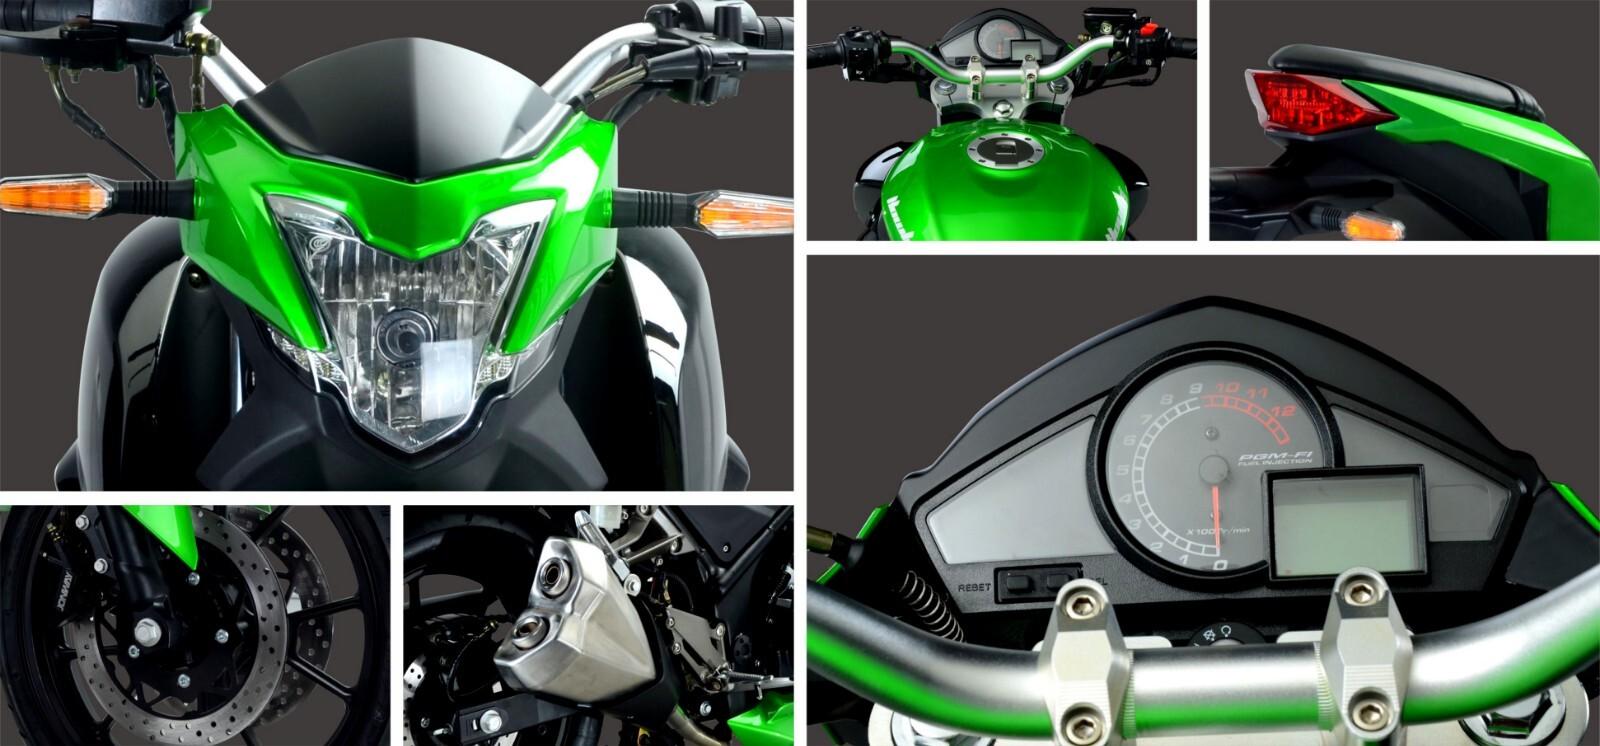 kawasaki motorcycle detailes